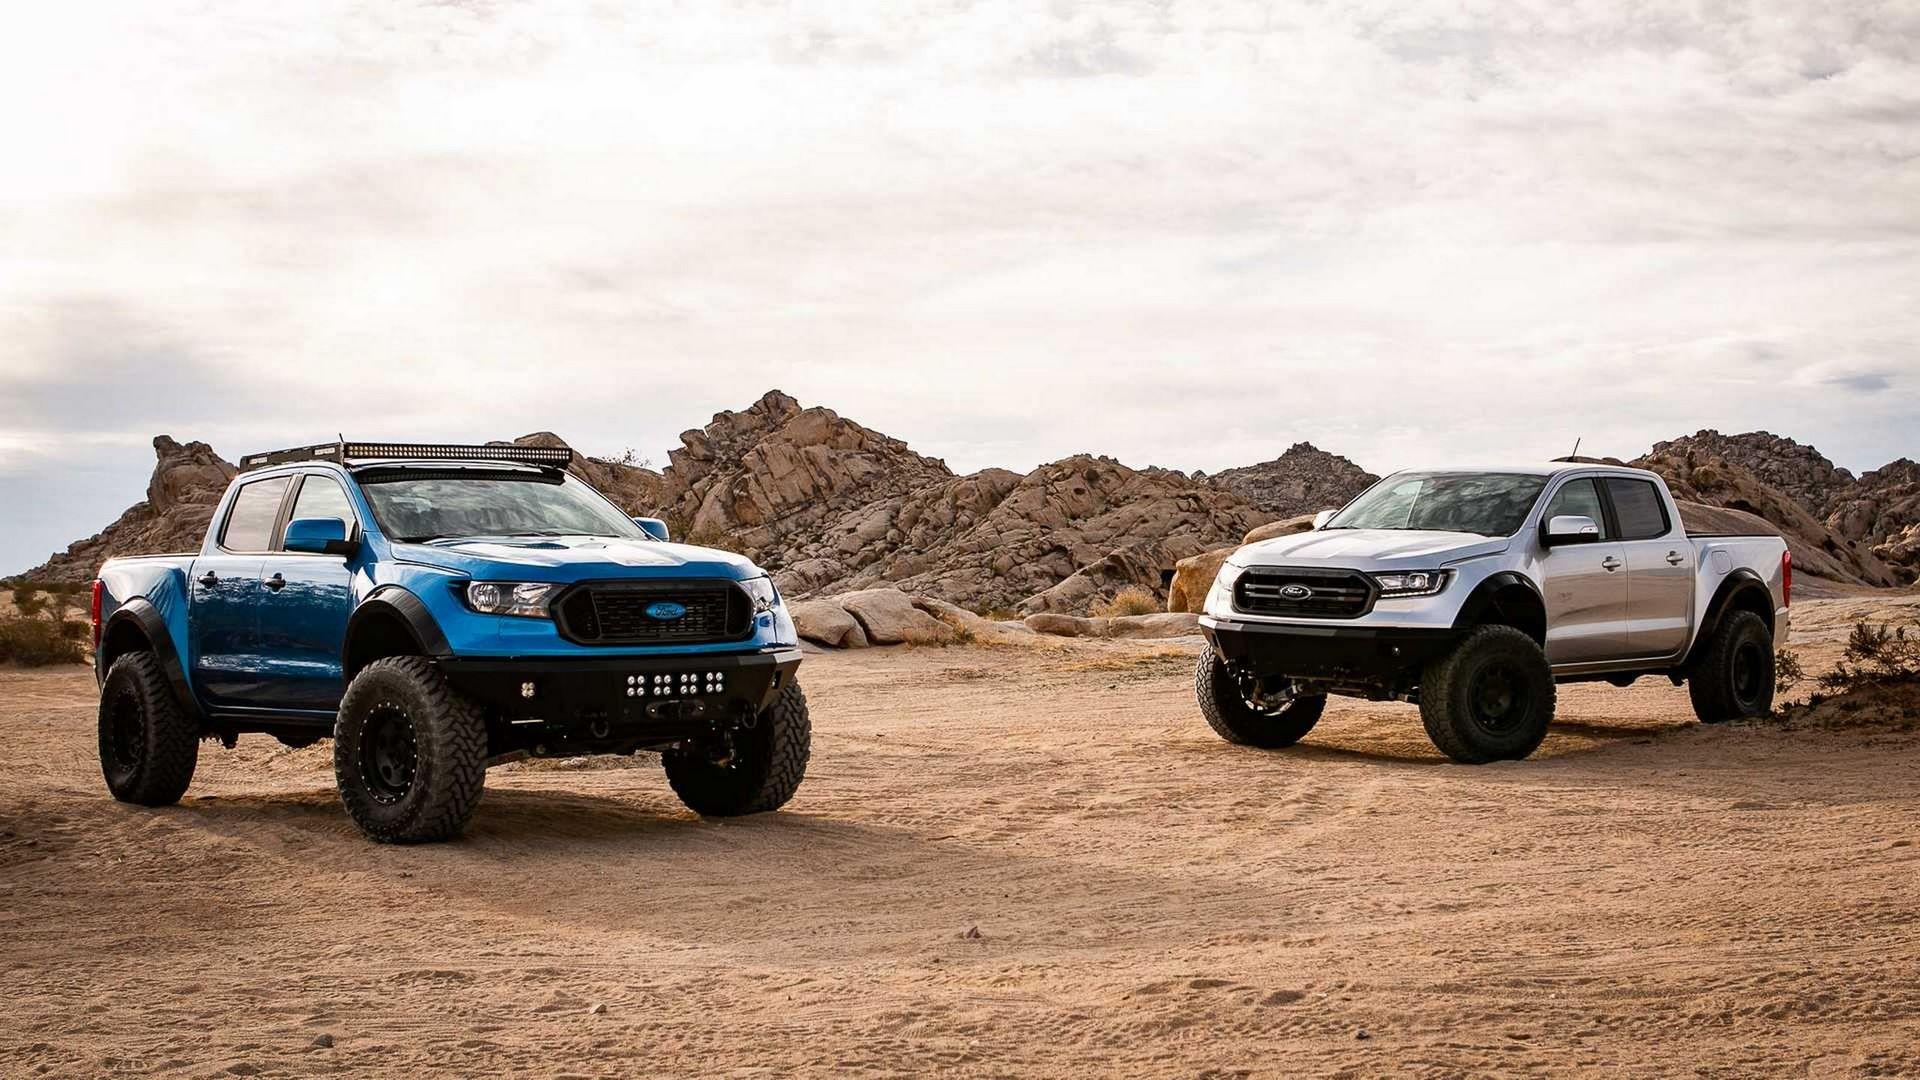 Ford-Ranger-Prorunner-By-APG-21